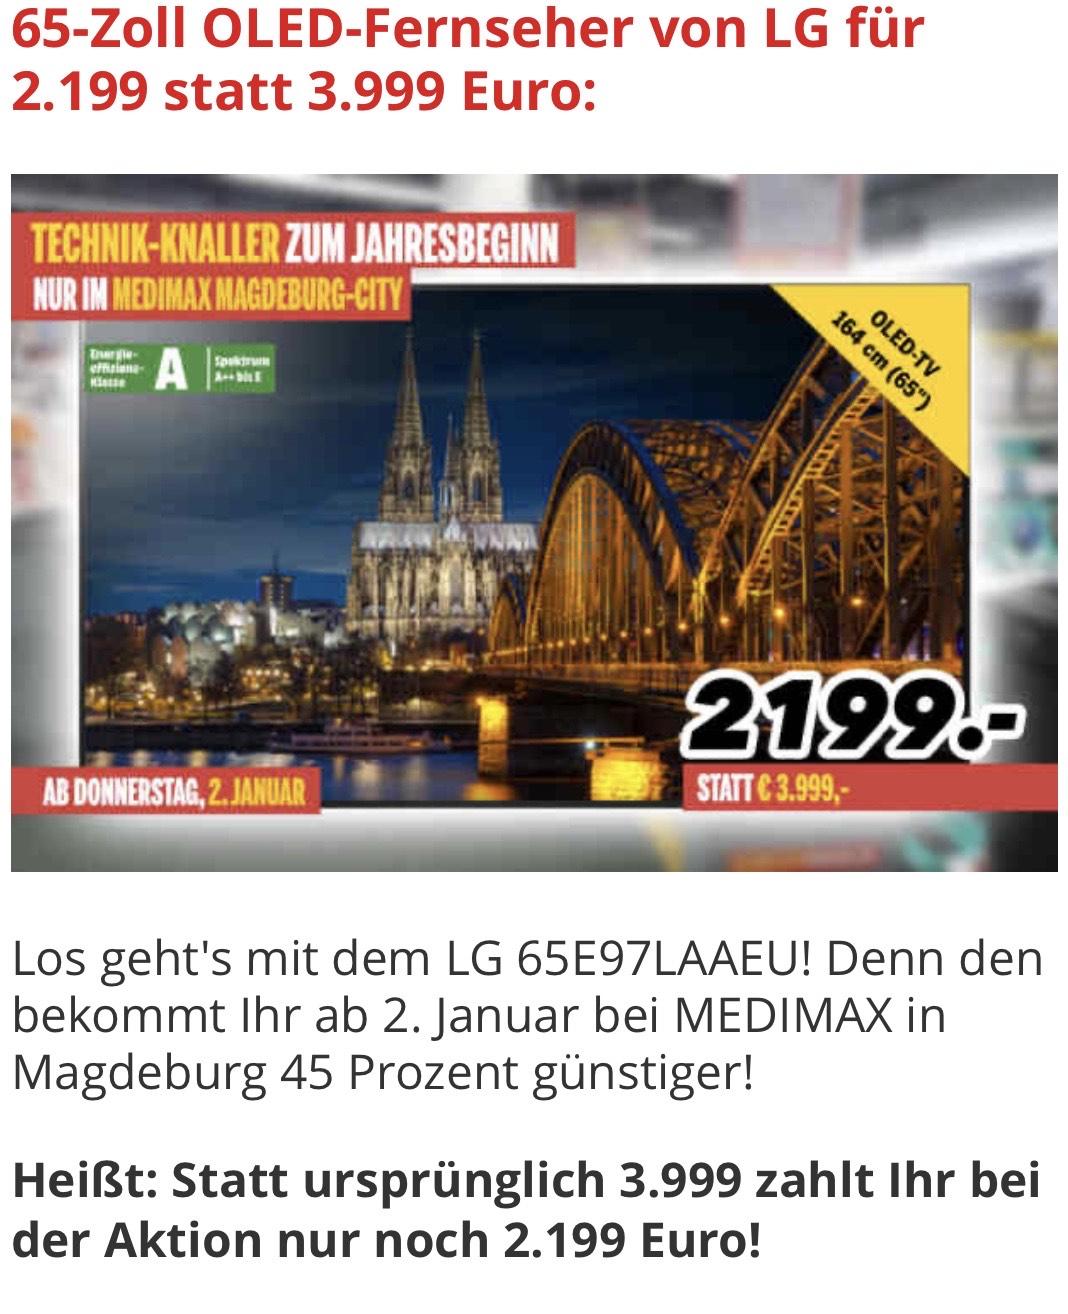 Lokal LG 65E97LAAEU Medi Max Magdeburg Citi